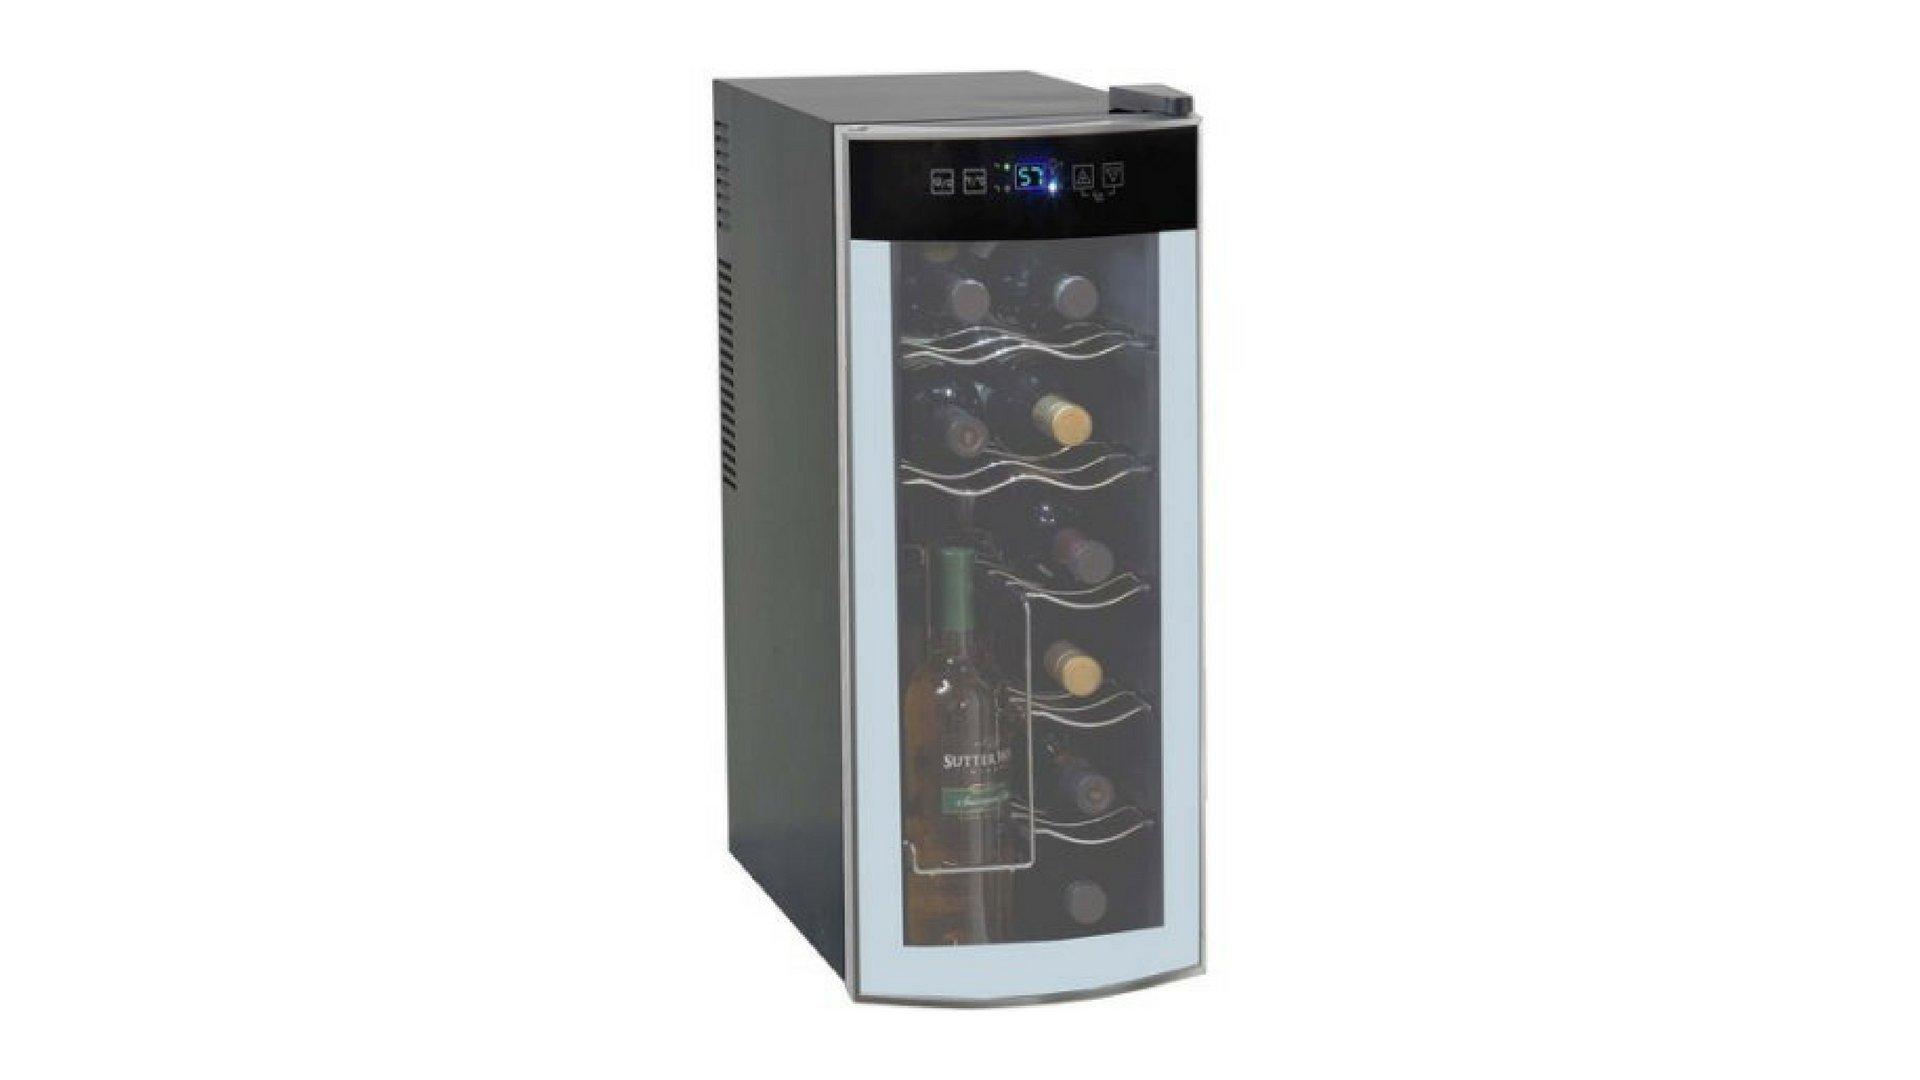 12-Bottle Avanti Quiet Thermoelectric Counter-top Wine Cooler - Stores Open Bottles!